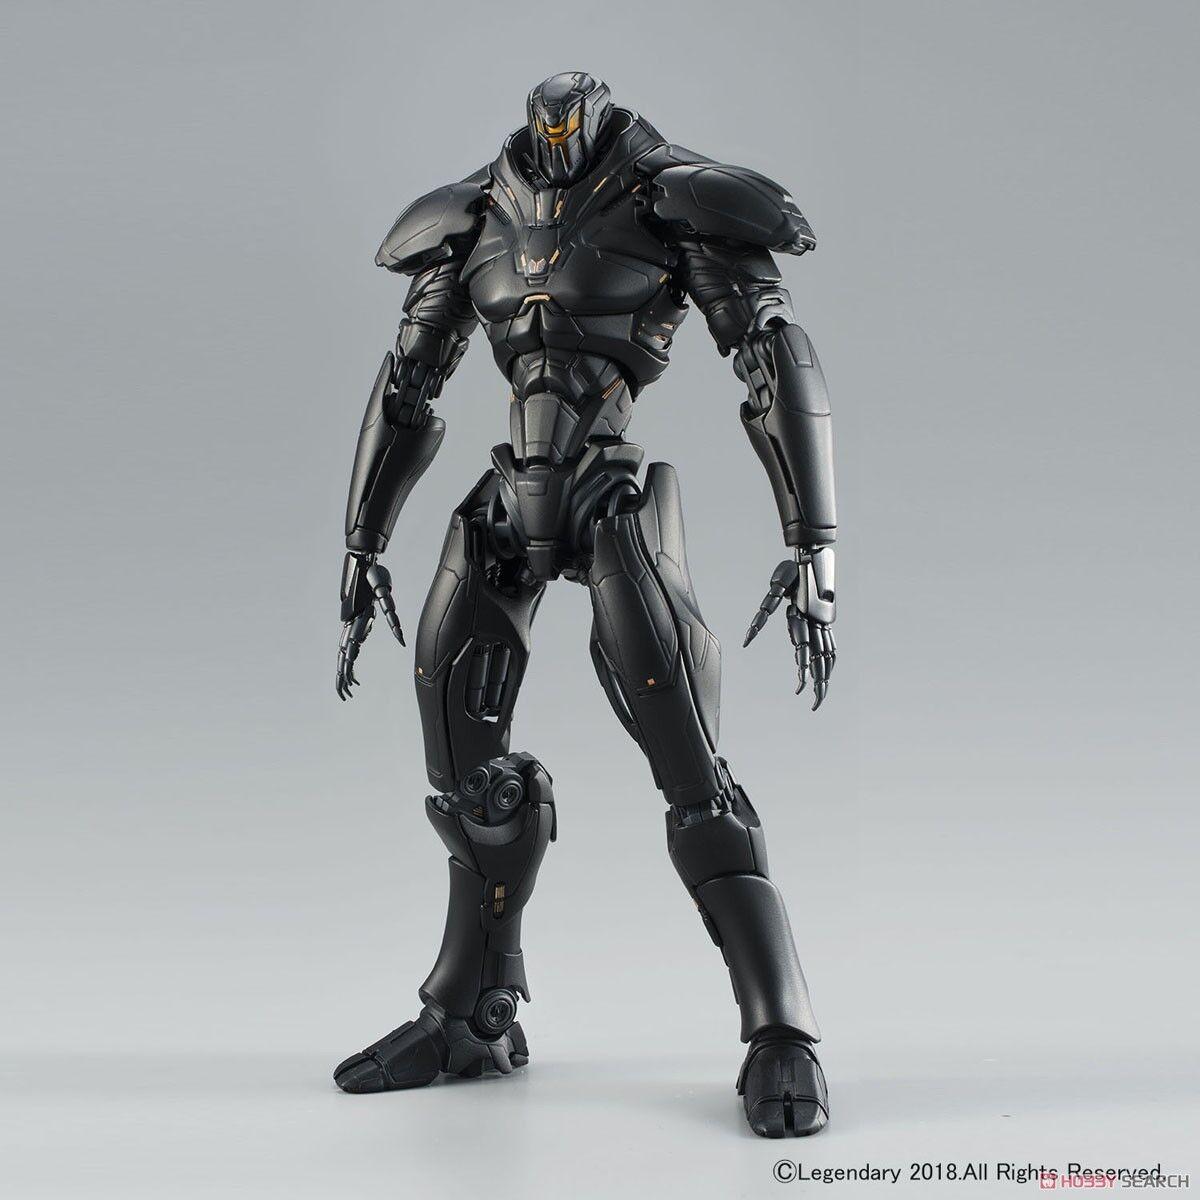 PACIFIC Rand Aufstand Jaeger Roboter Obsidian Fury High Besoldungsgruppe Modell